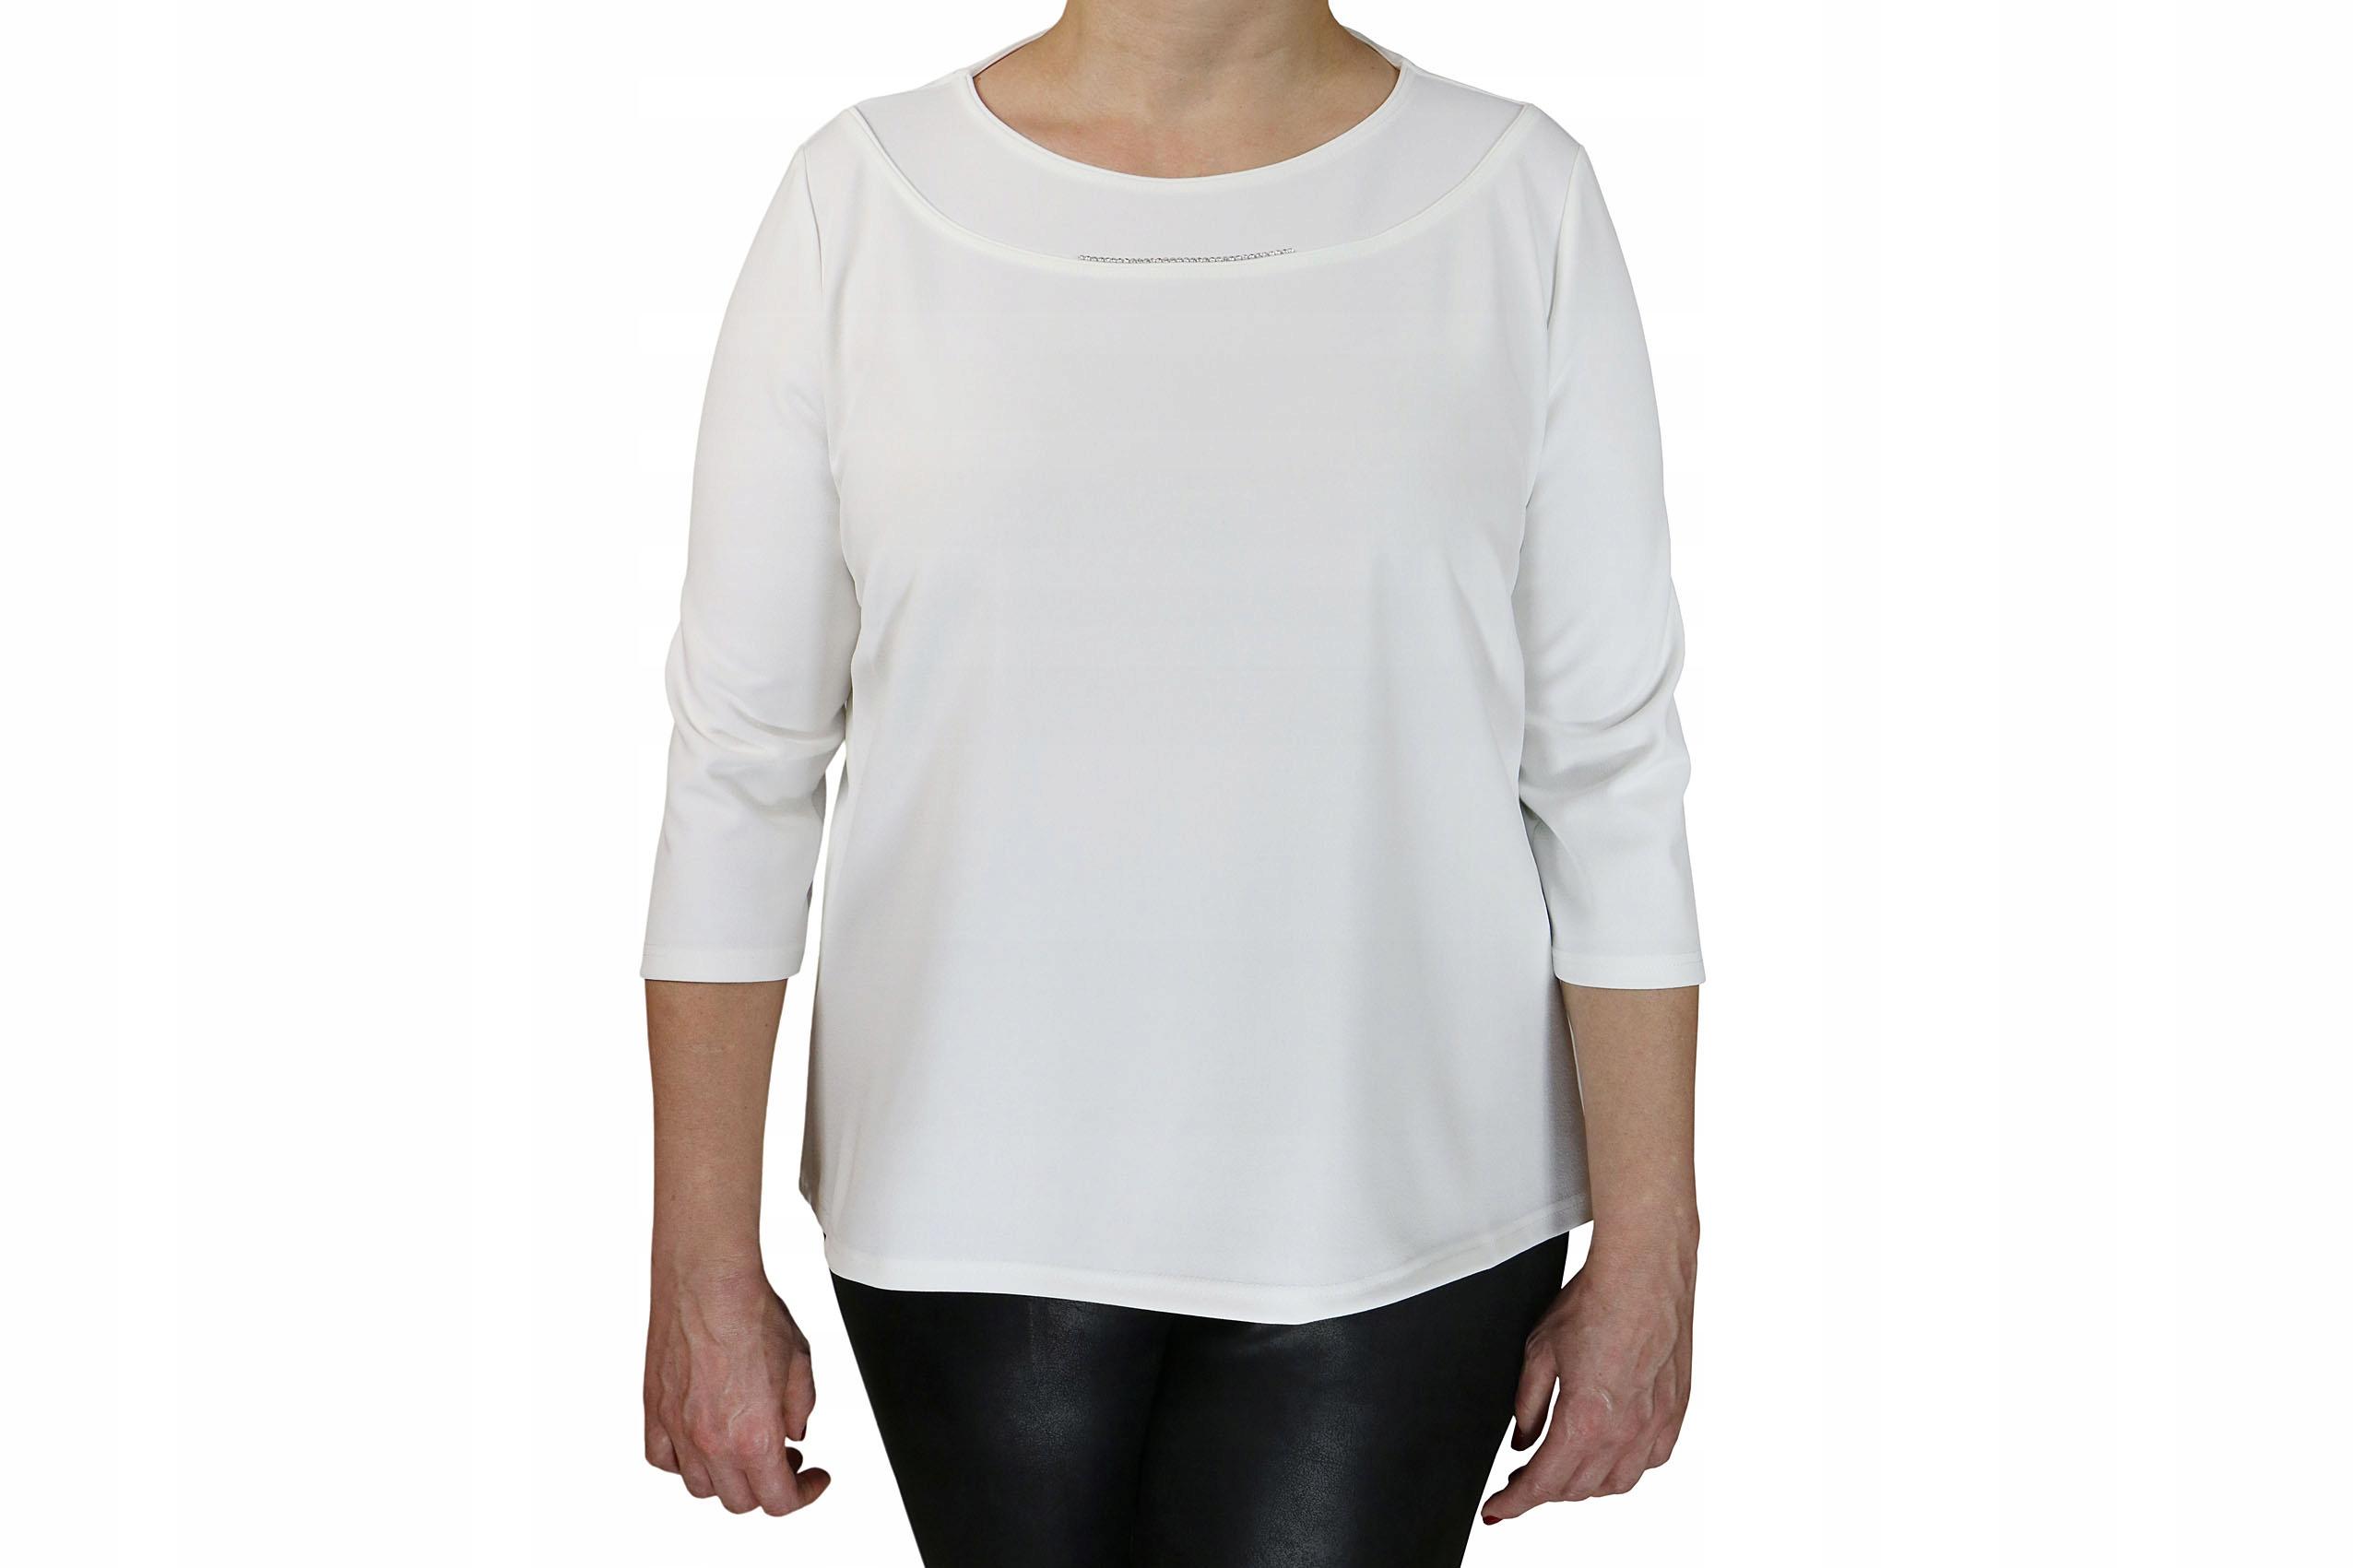 d6ca86056350c1 bluzka prosta elegancka dekolt cyrkonie 46 ecru - 7732847018 ...